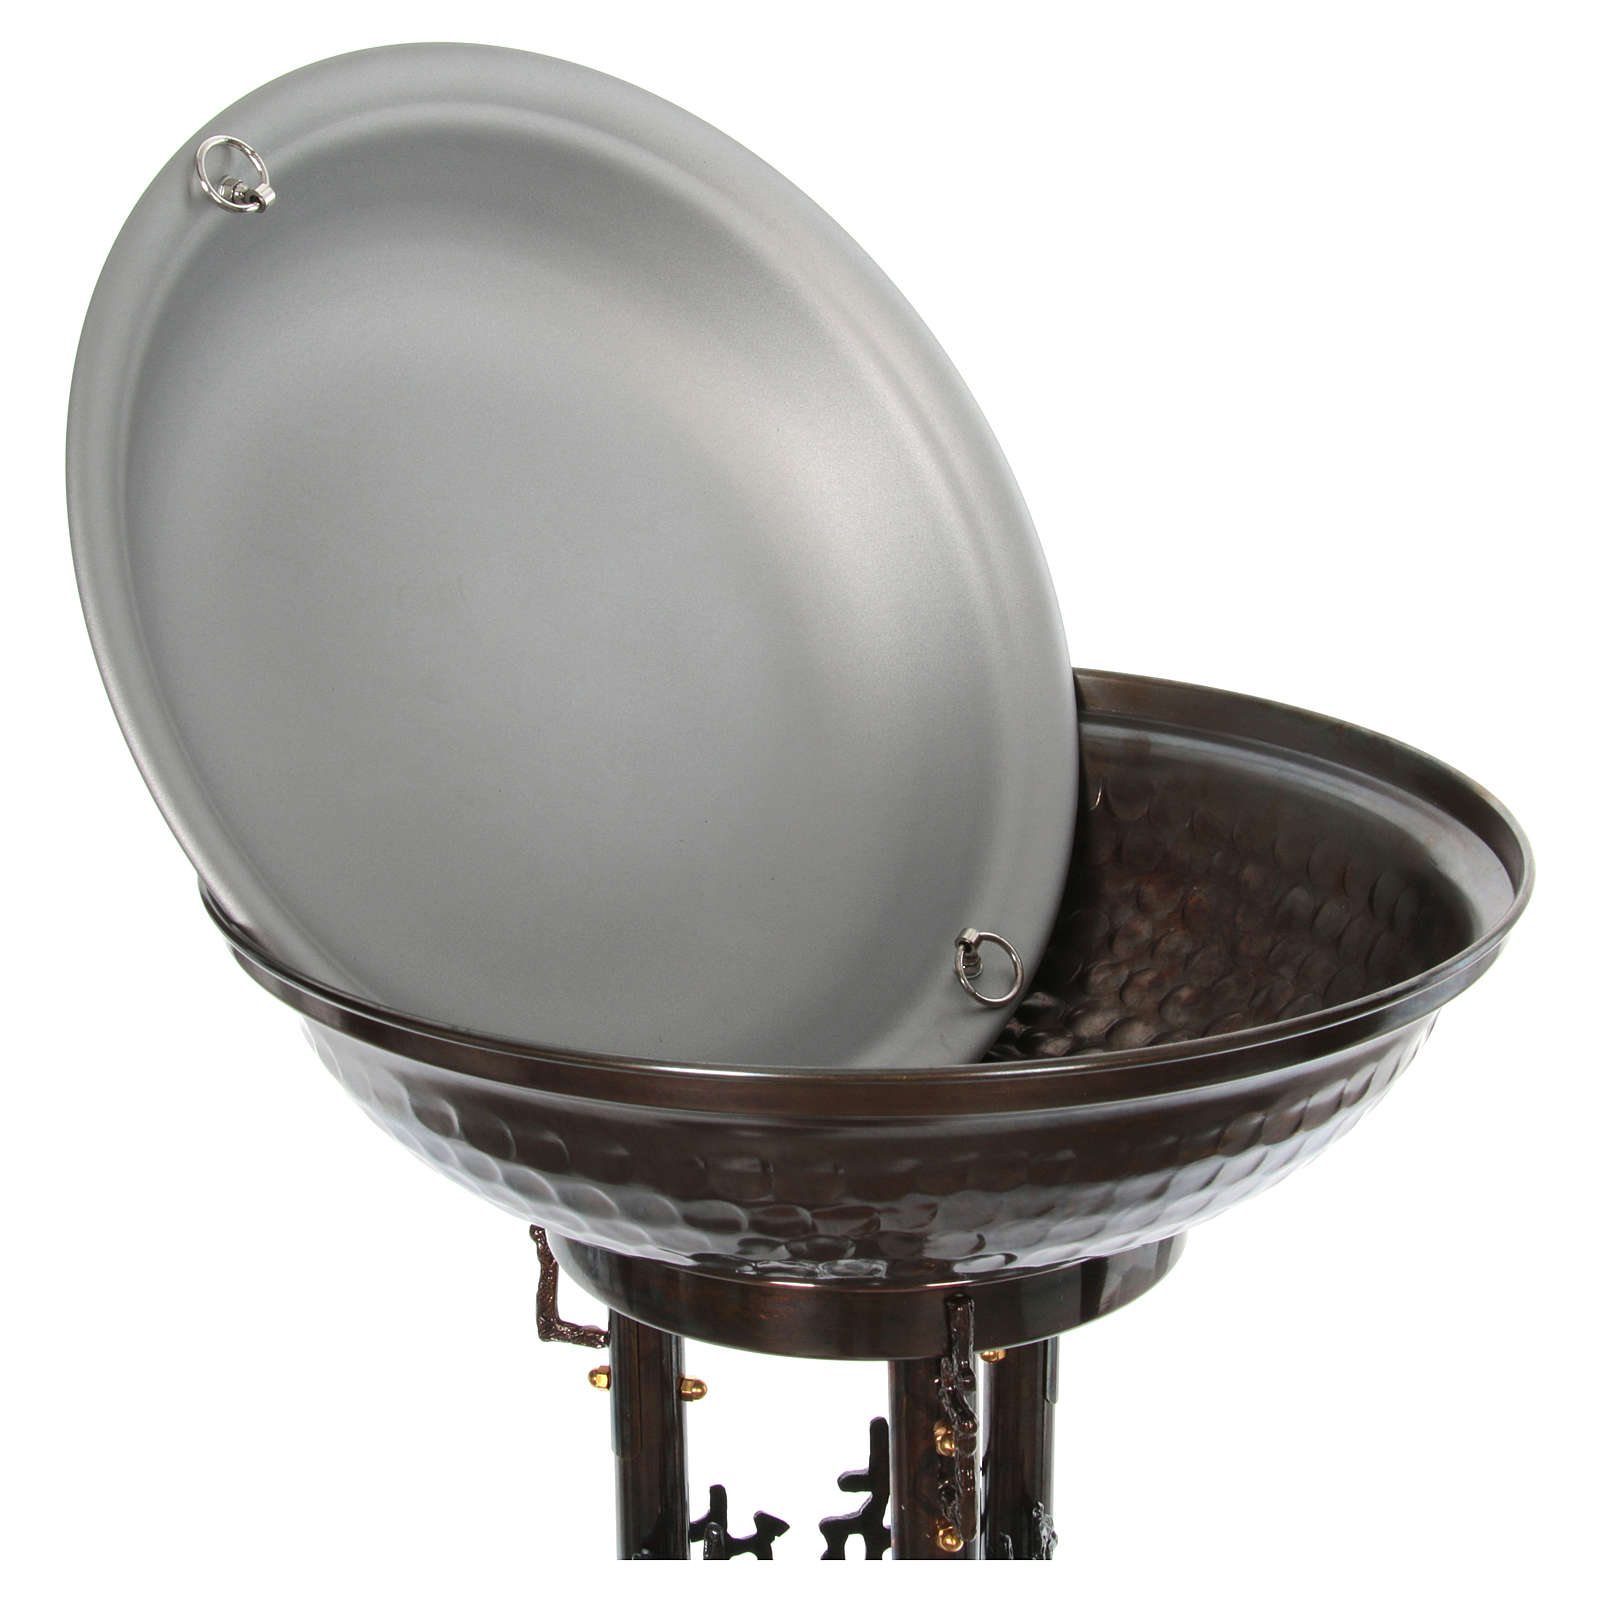 Fonte battesimale moderno in bronzo 4